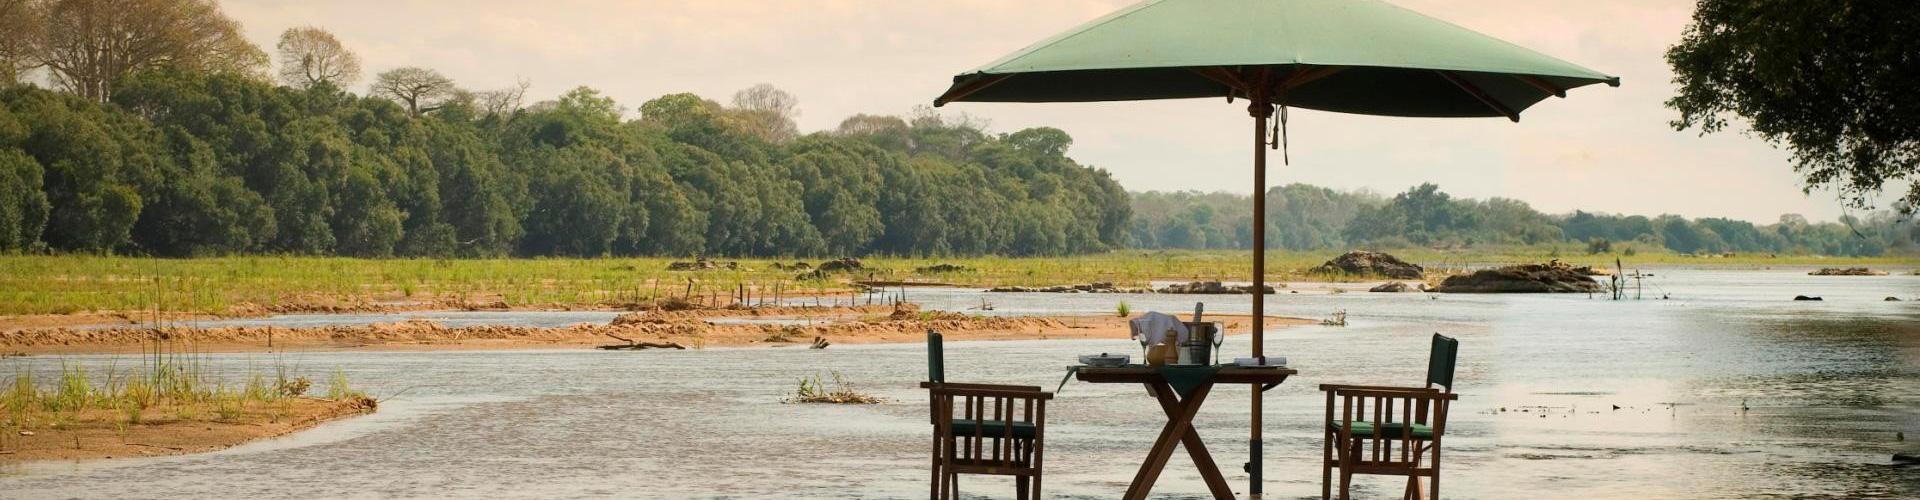 Breakfast in the Lugenda River